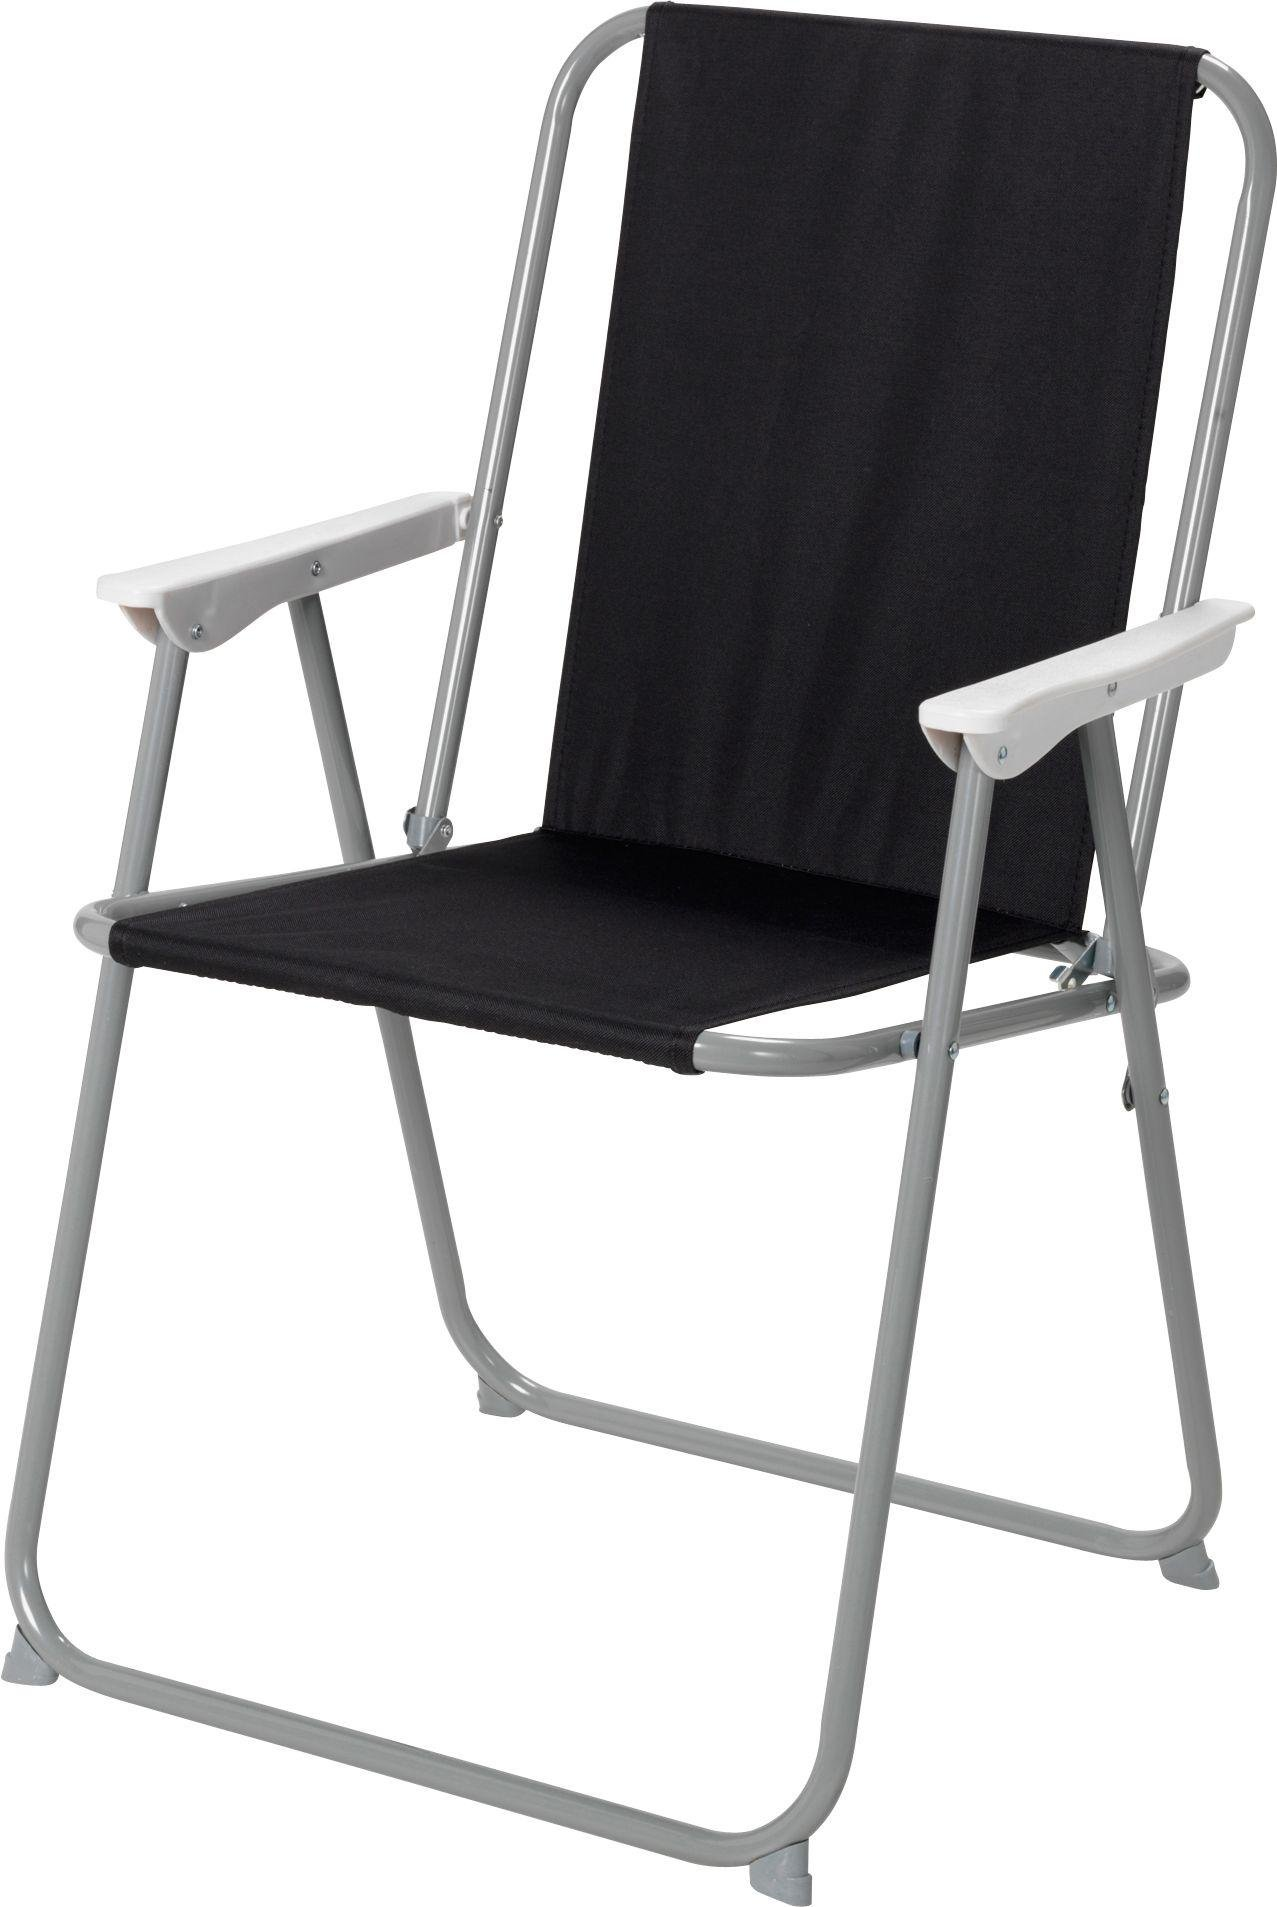 Buy Folding Picnic Chair Black at Argoscouk Your  : 6511373RZ001AUC1348918Webampw570amph513 from www.argos.co.uk size 570 x 513 jpeg 19kB